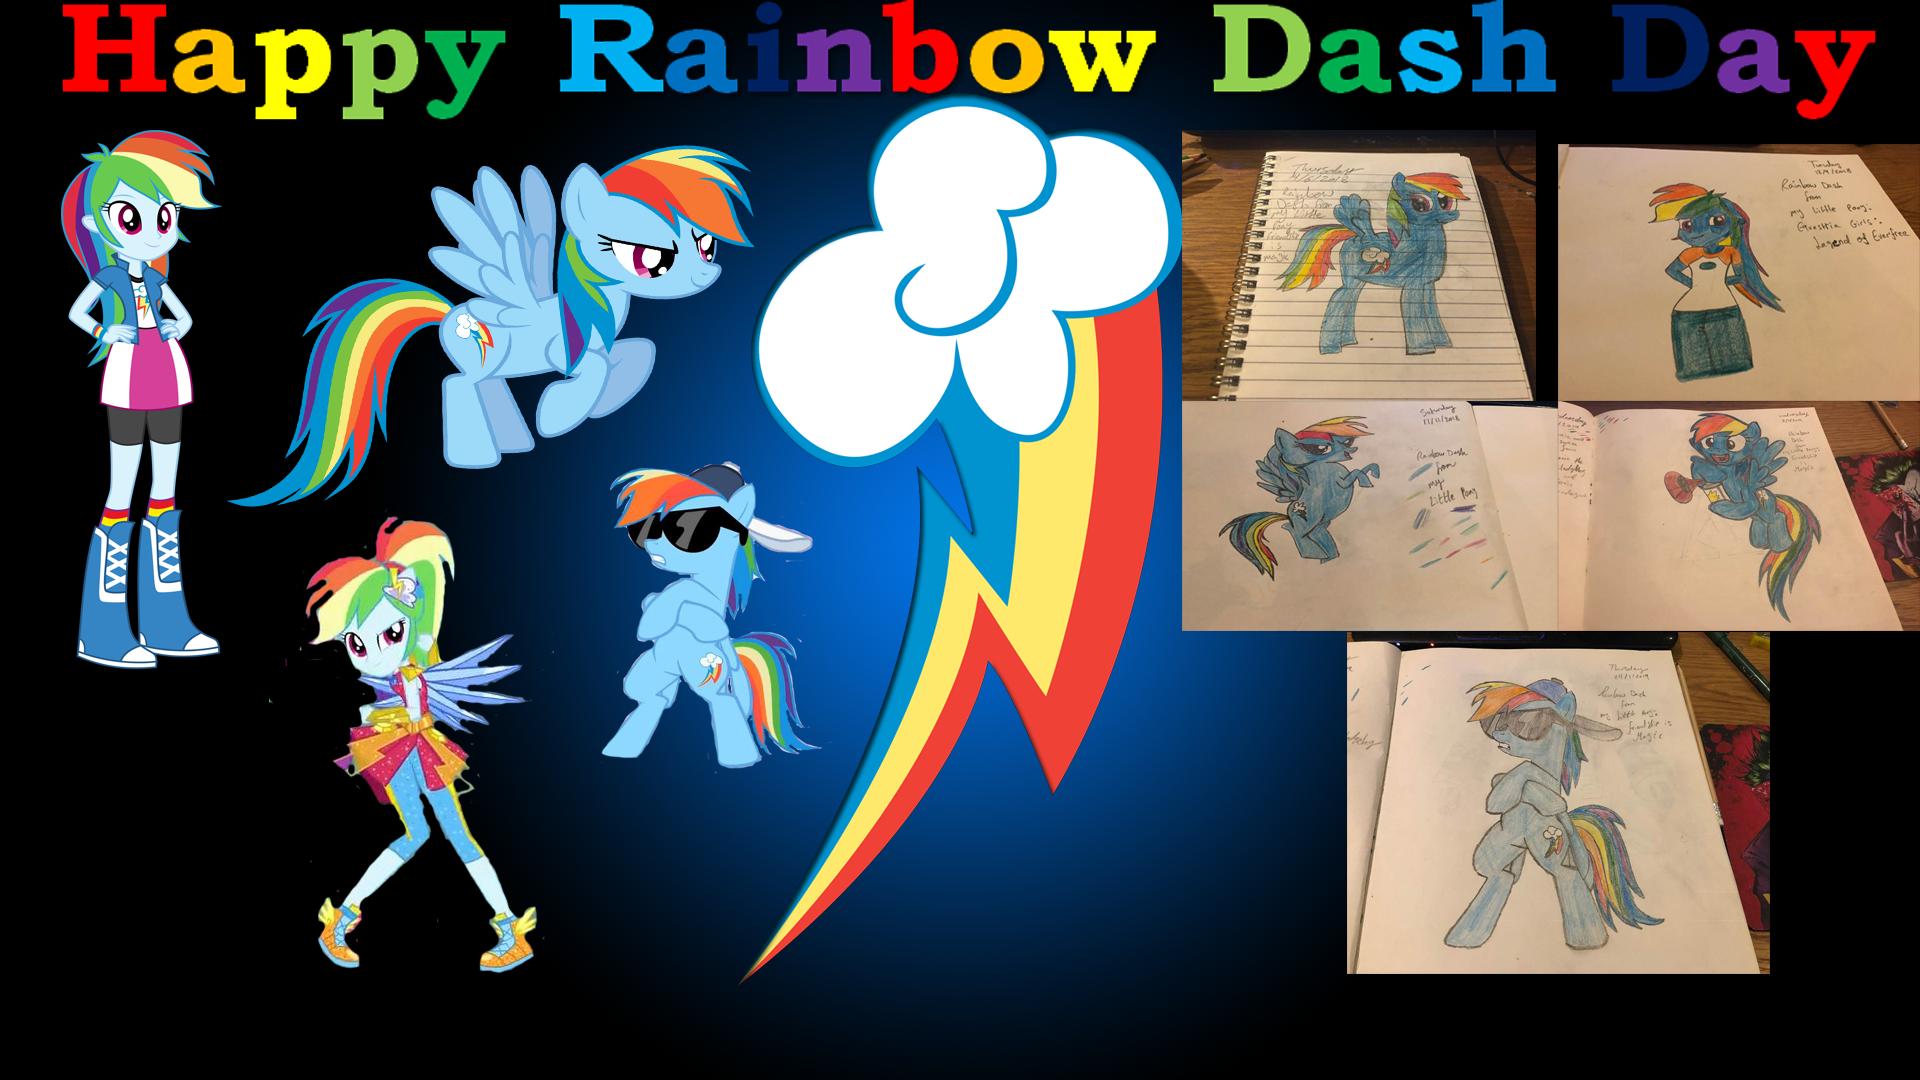 Happy Rainbow Dash Day Collage by Rizo2612Studios